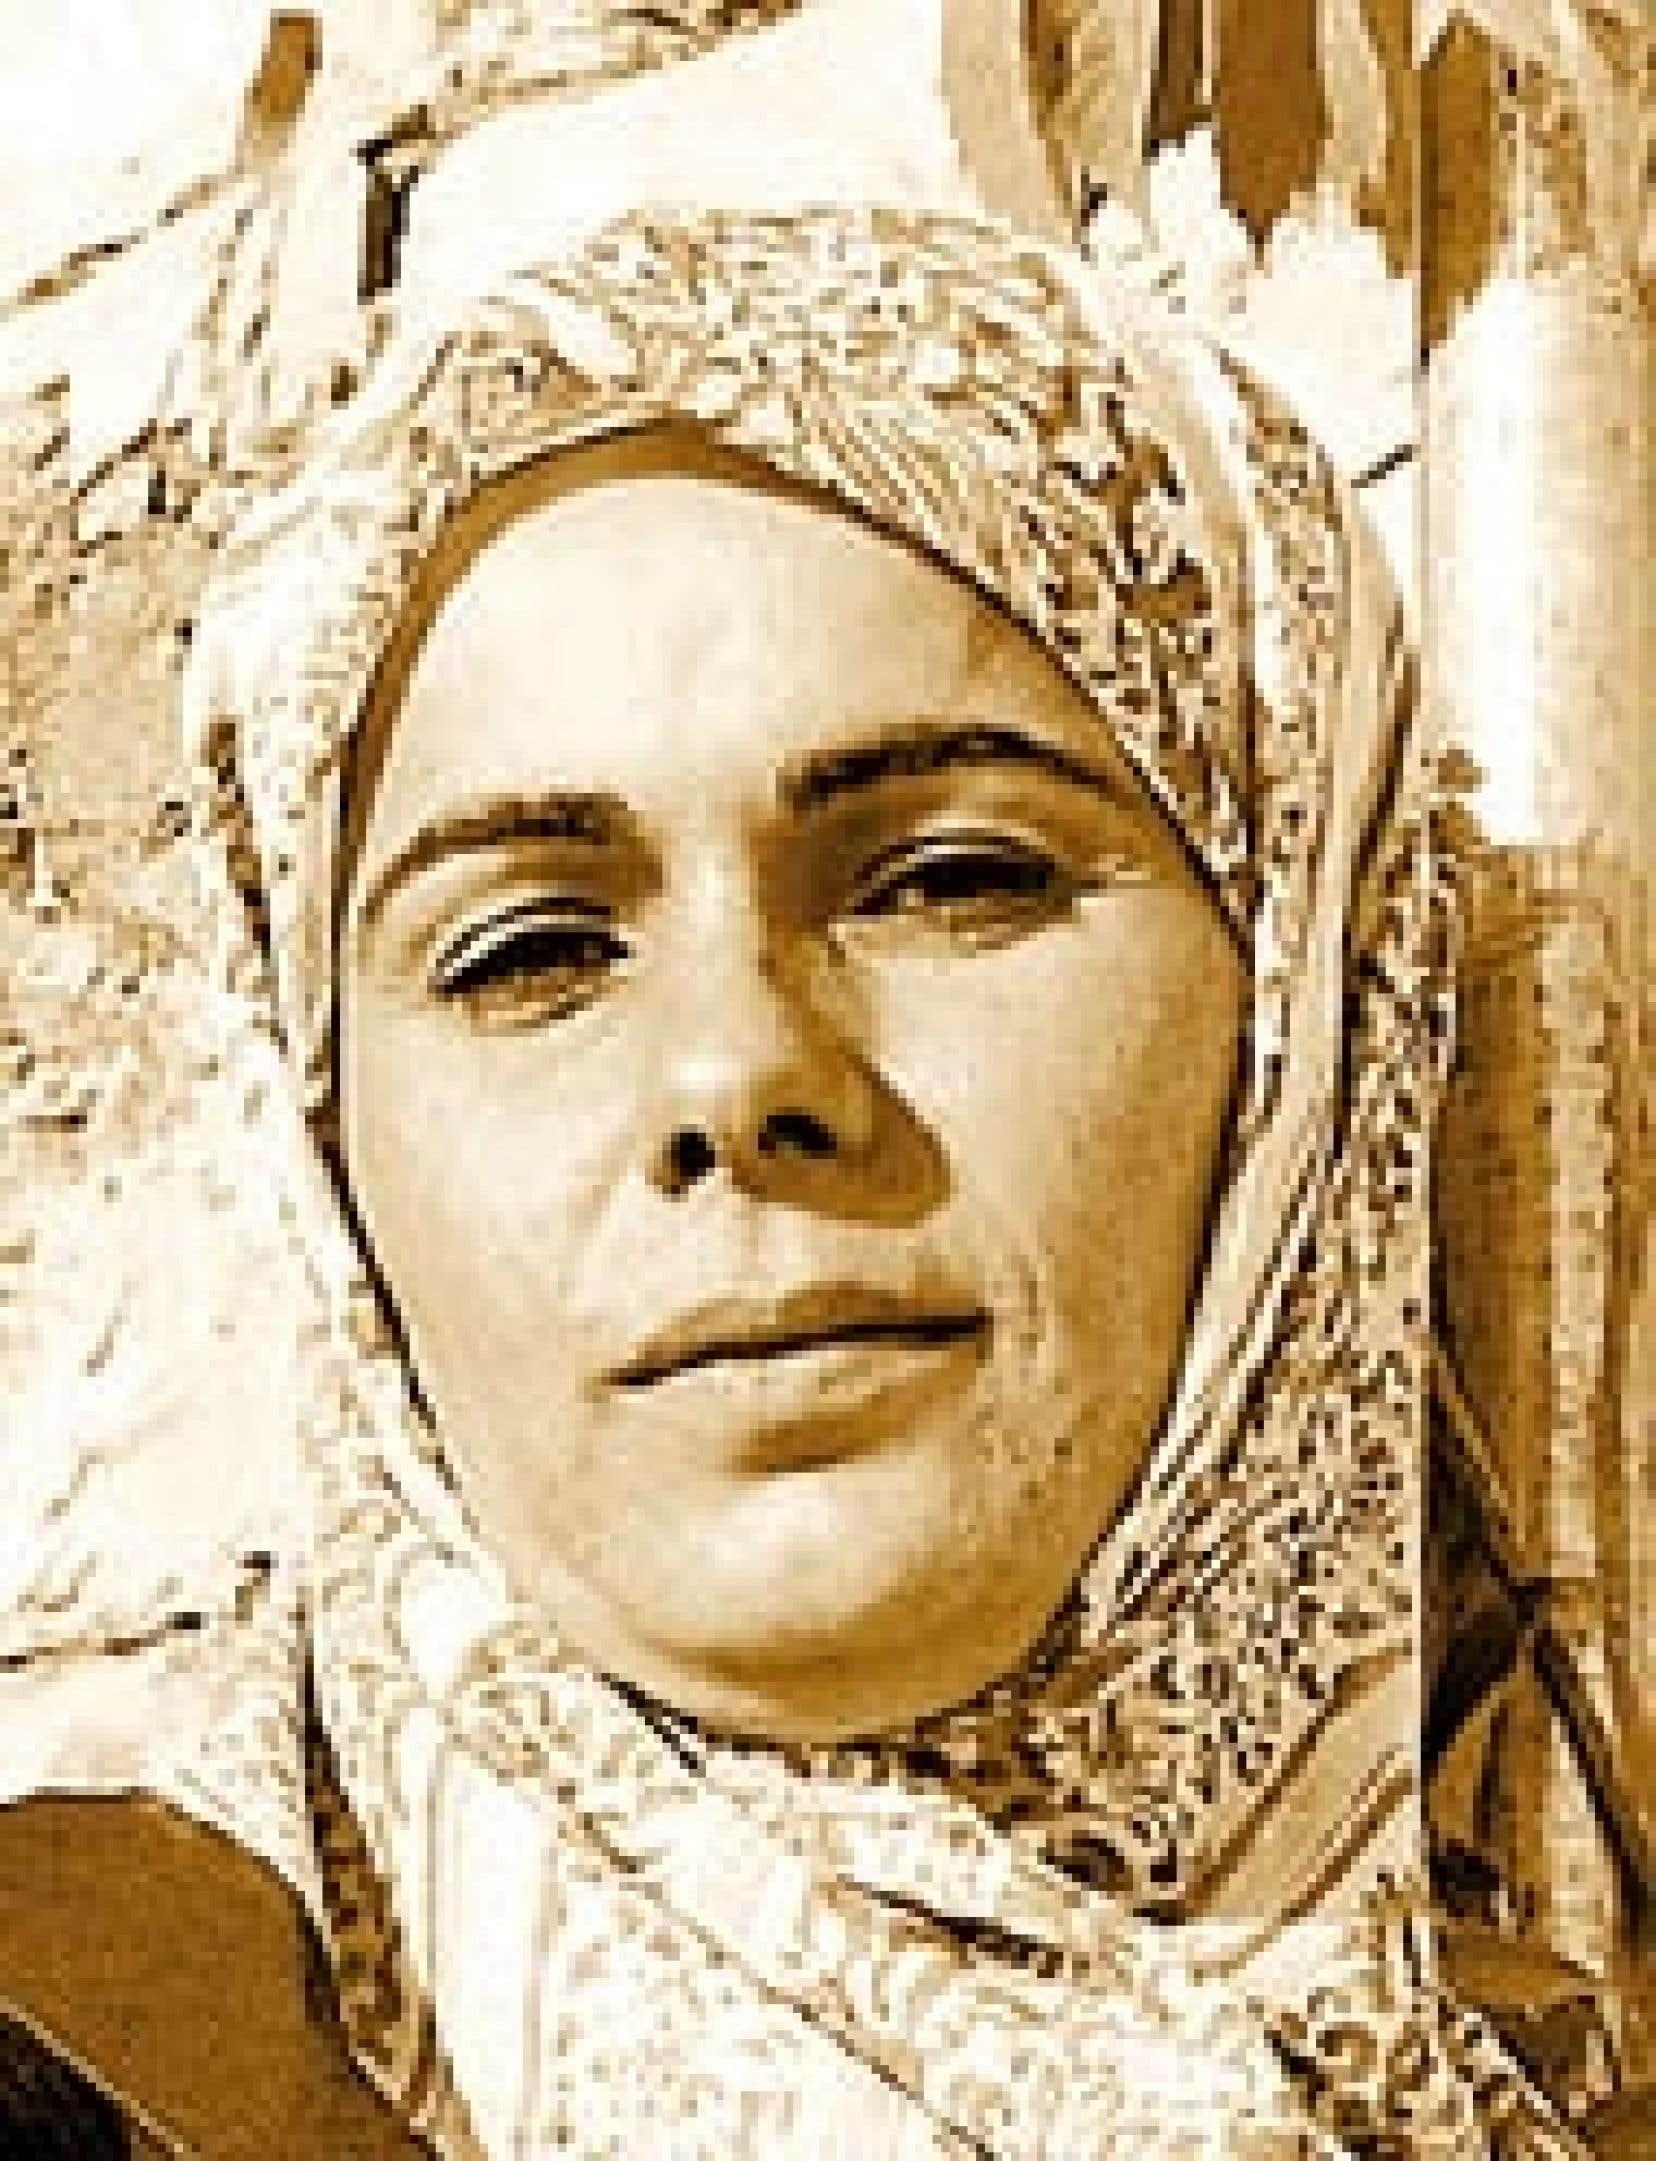 Atika Sleiman à Kfar Chouba, le 2 septembre 2000  Source: Josée Lambert